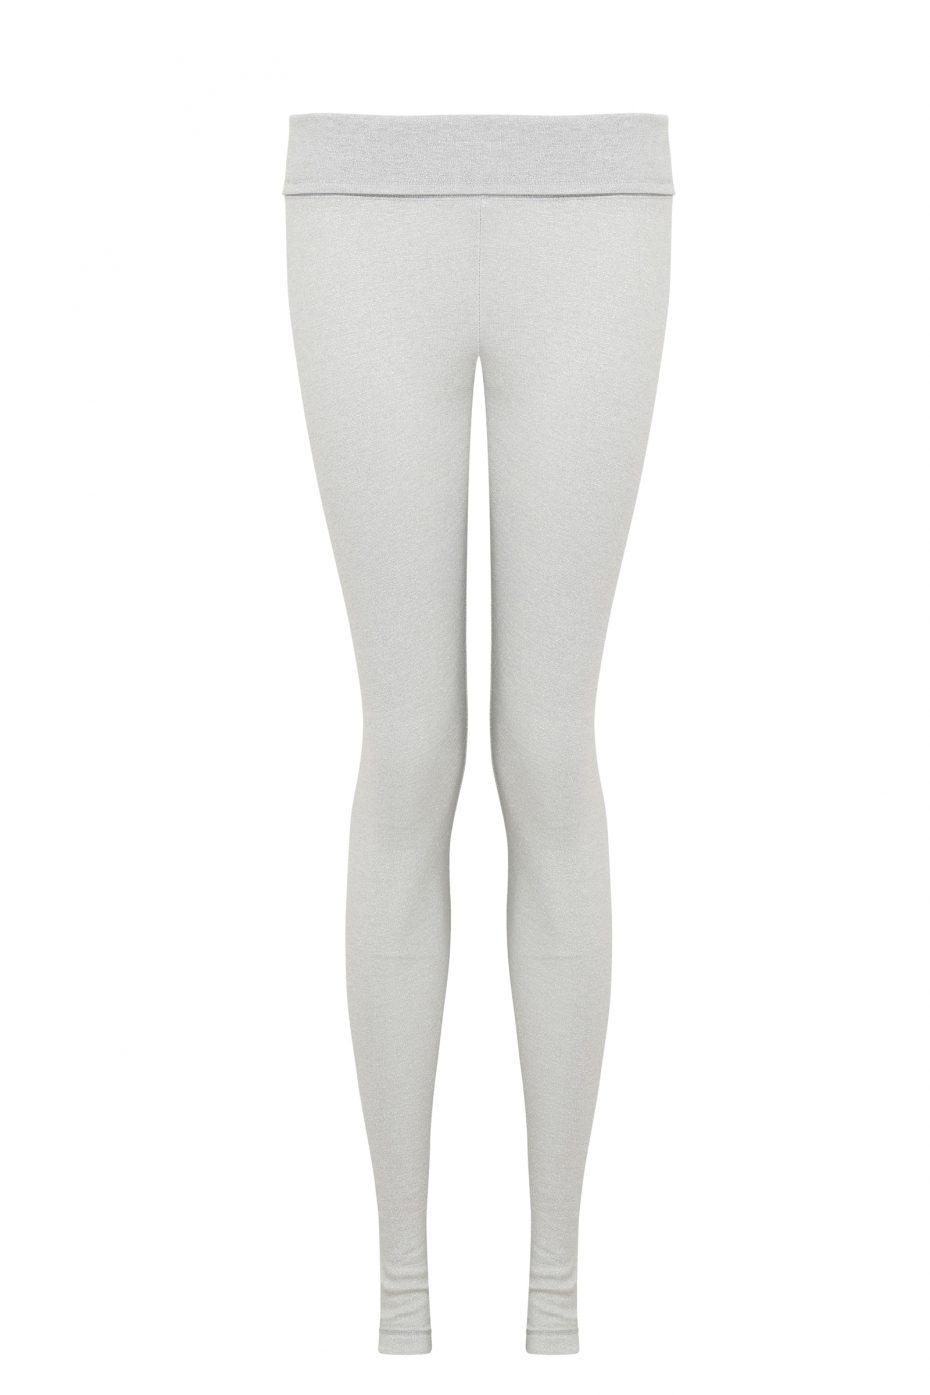 Sparkle Collection 'S'No White' : leggings -0